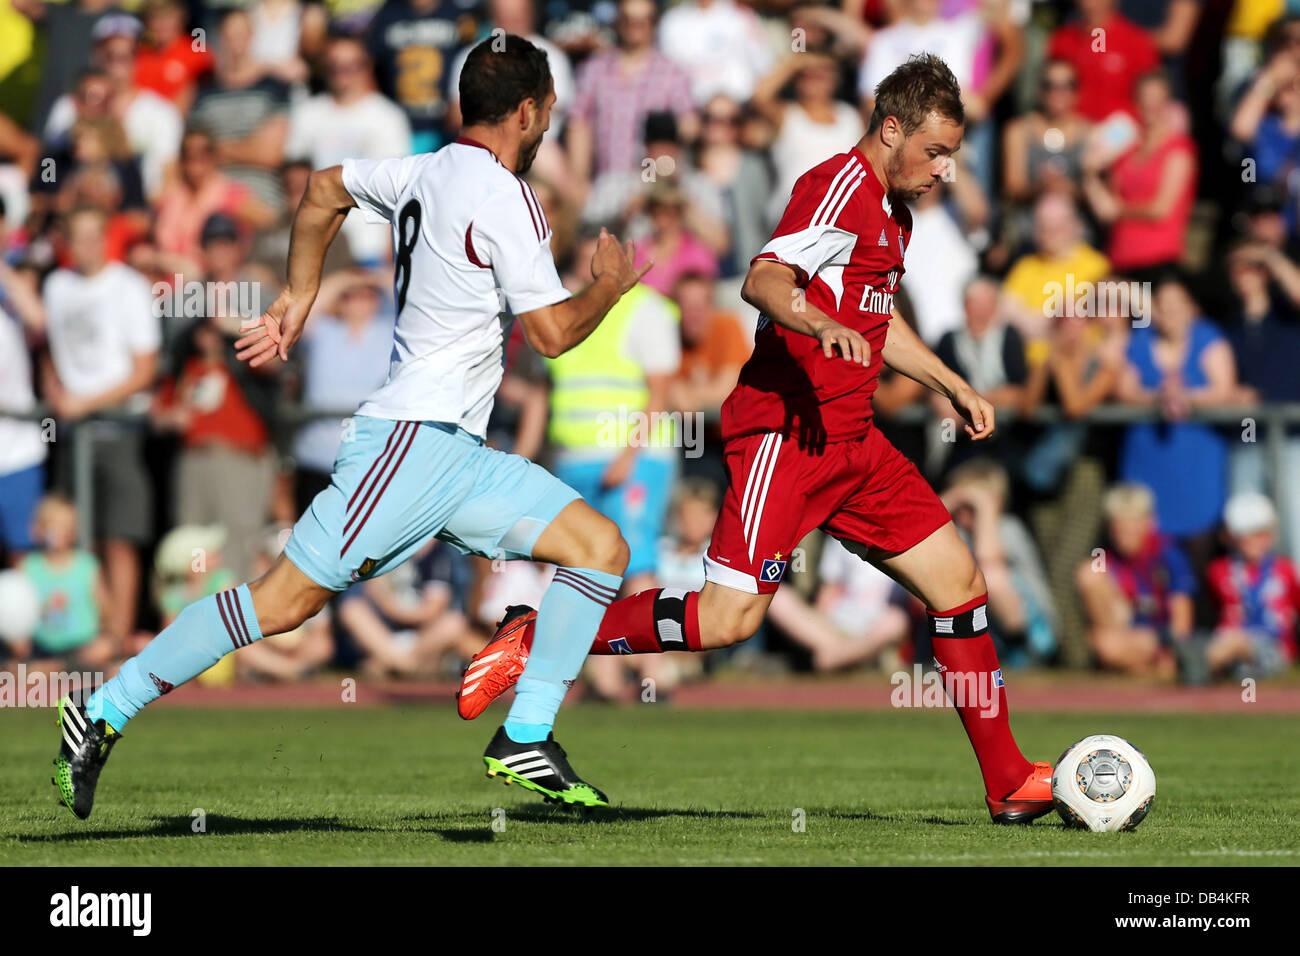 Flensburg, Germany. 23rd July, 2013. United's Razvan Rat (L) vies for the ball with Hamburg's Maximilian - Stock Image